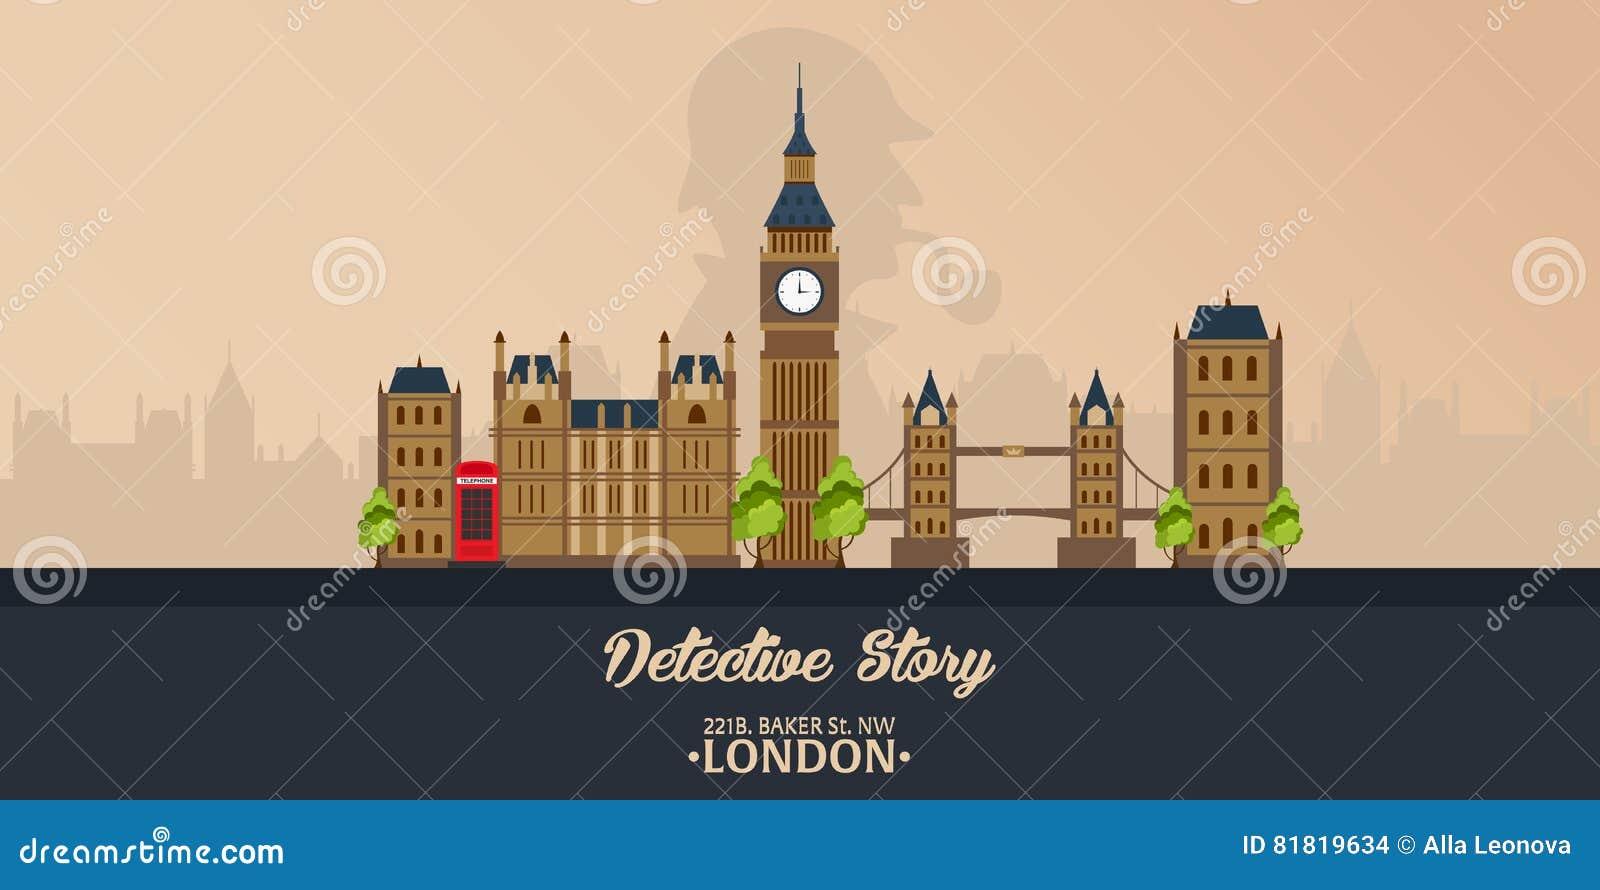 Sherlock Holmes 侦探例证 与福尔摩斯的例证 贝克街道221B 伦敦 大的禁令